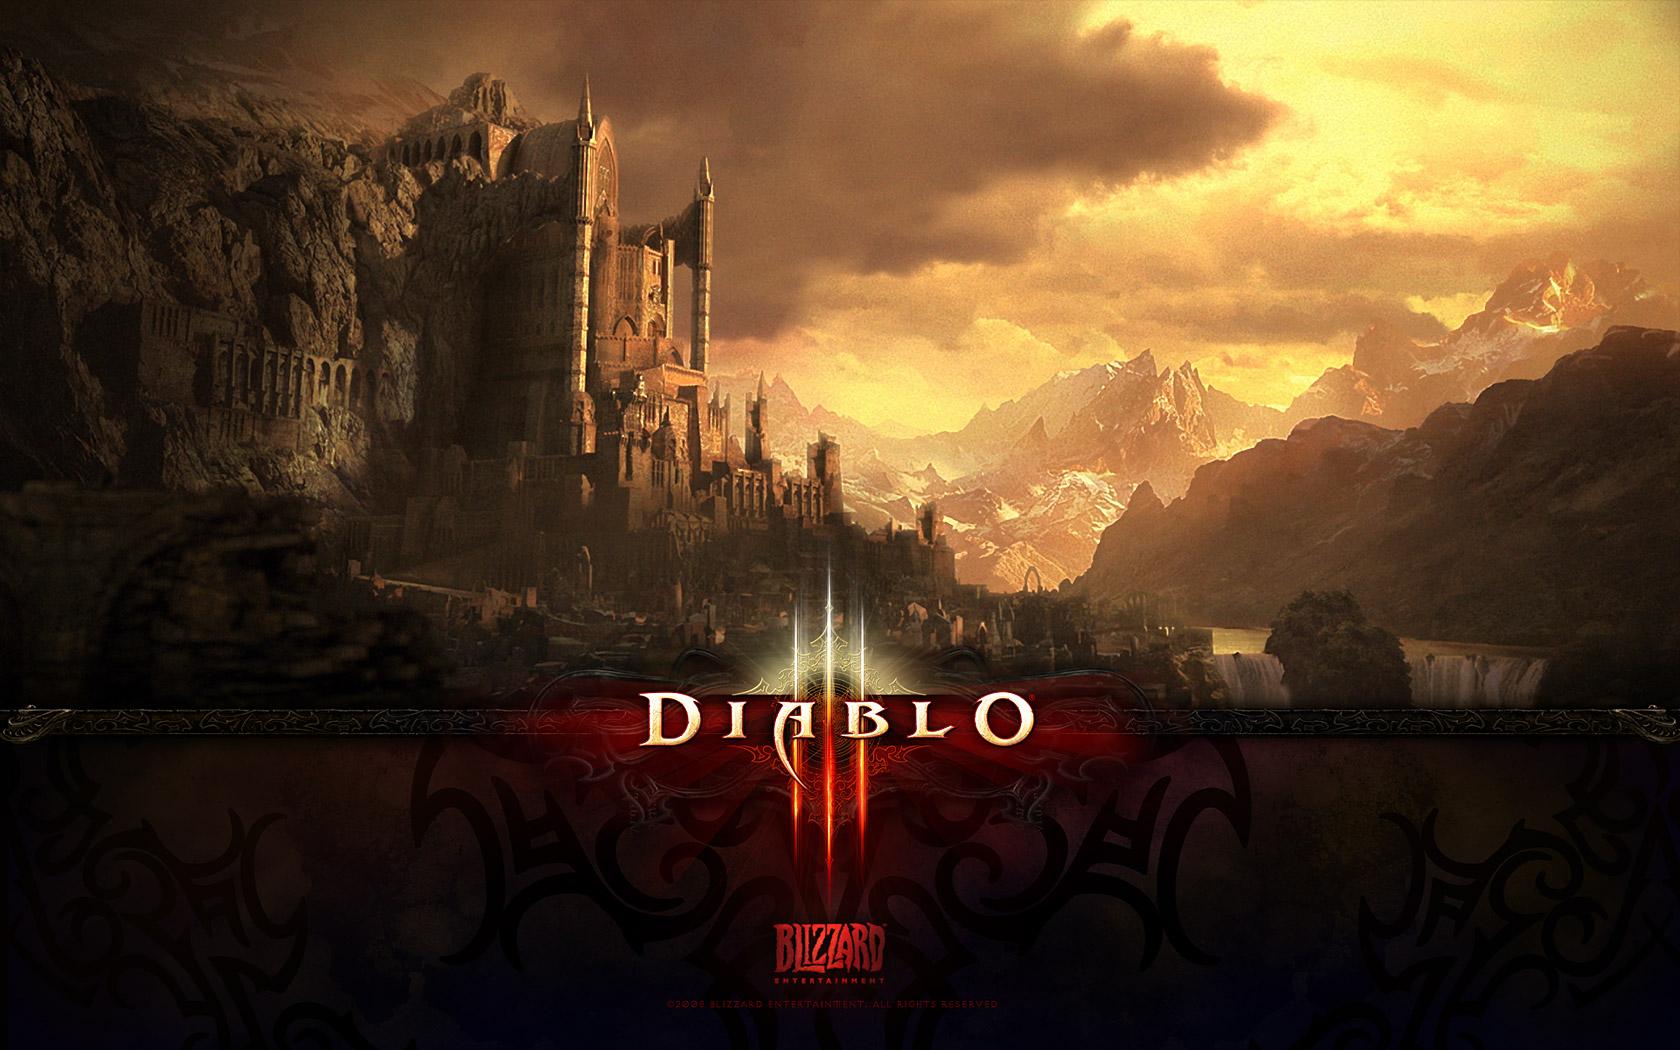 Download Blizzard Entertainment Wallpaper 1680x1050 1680x1050